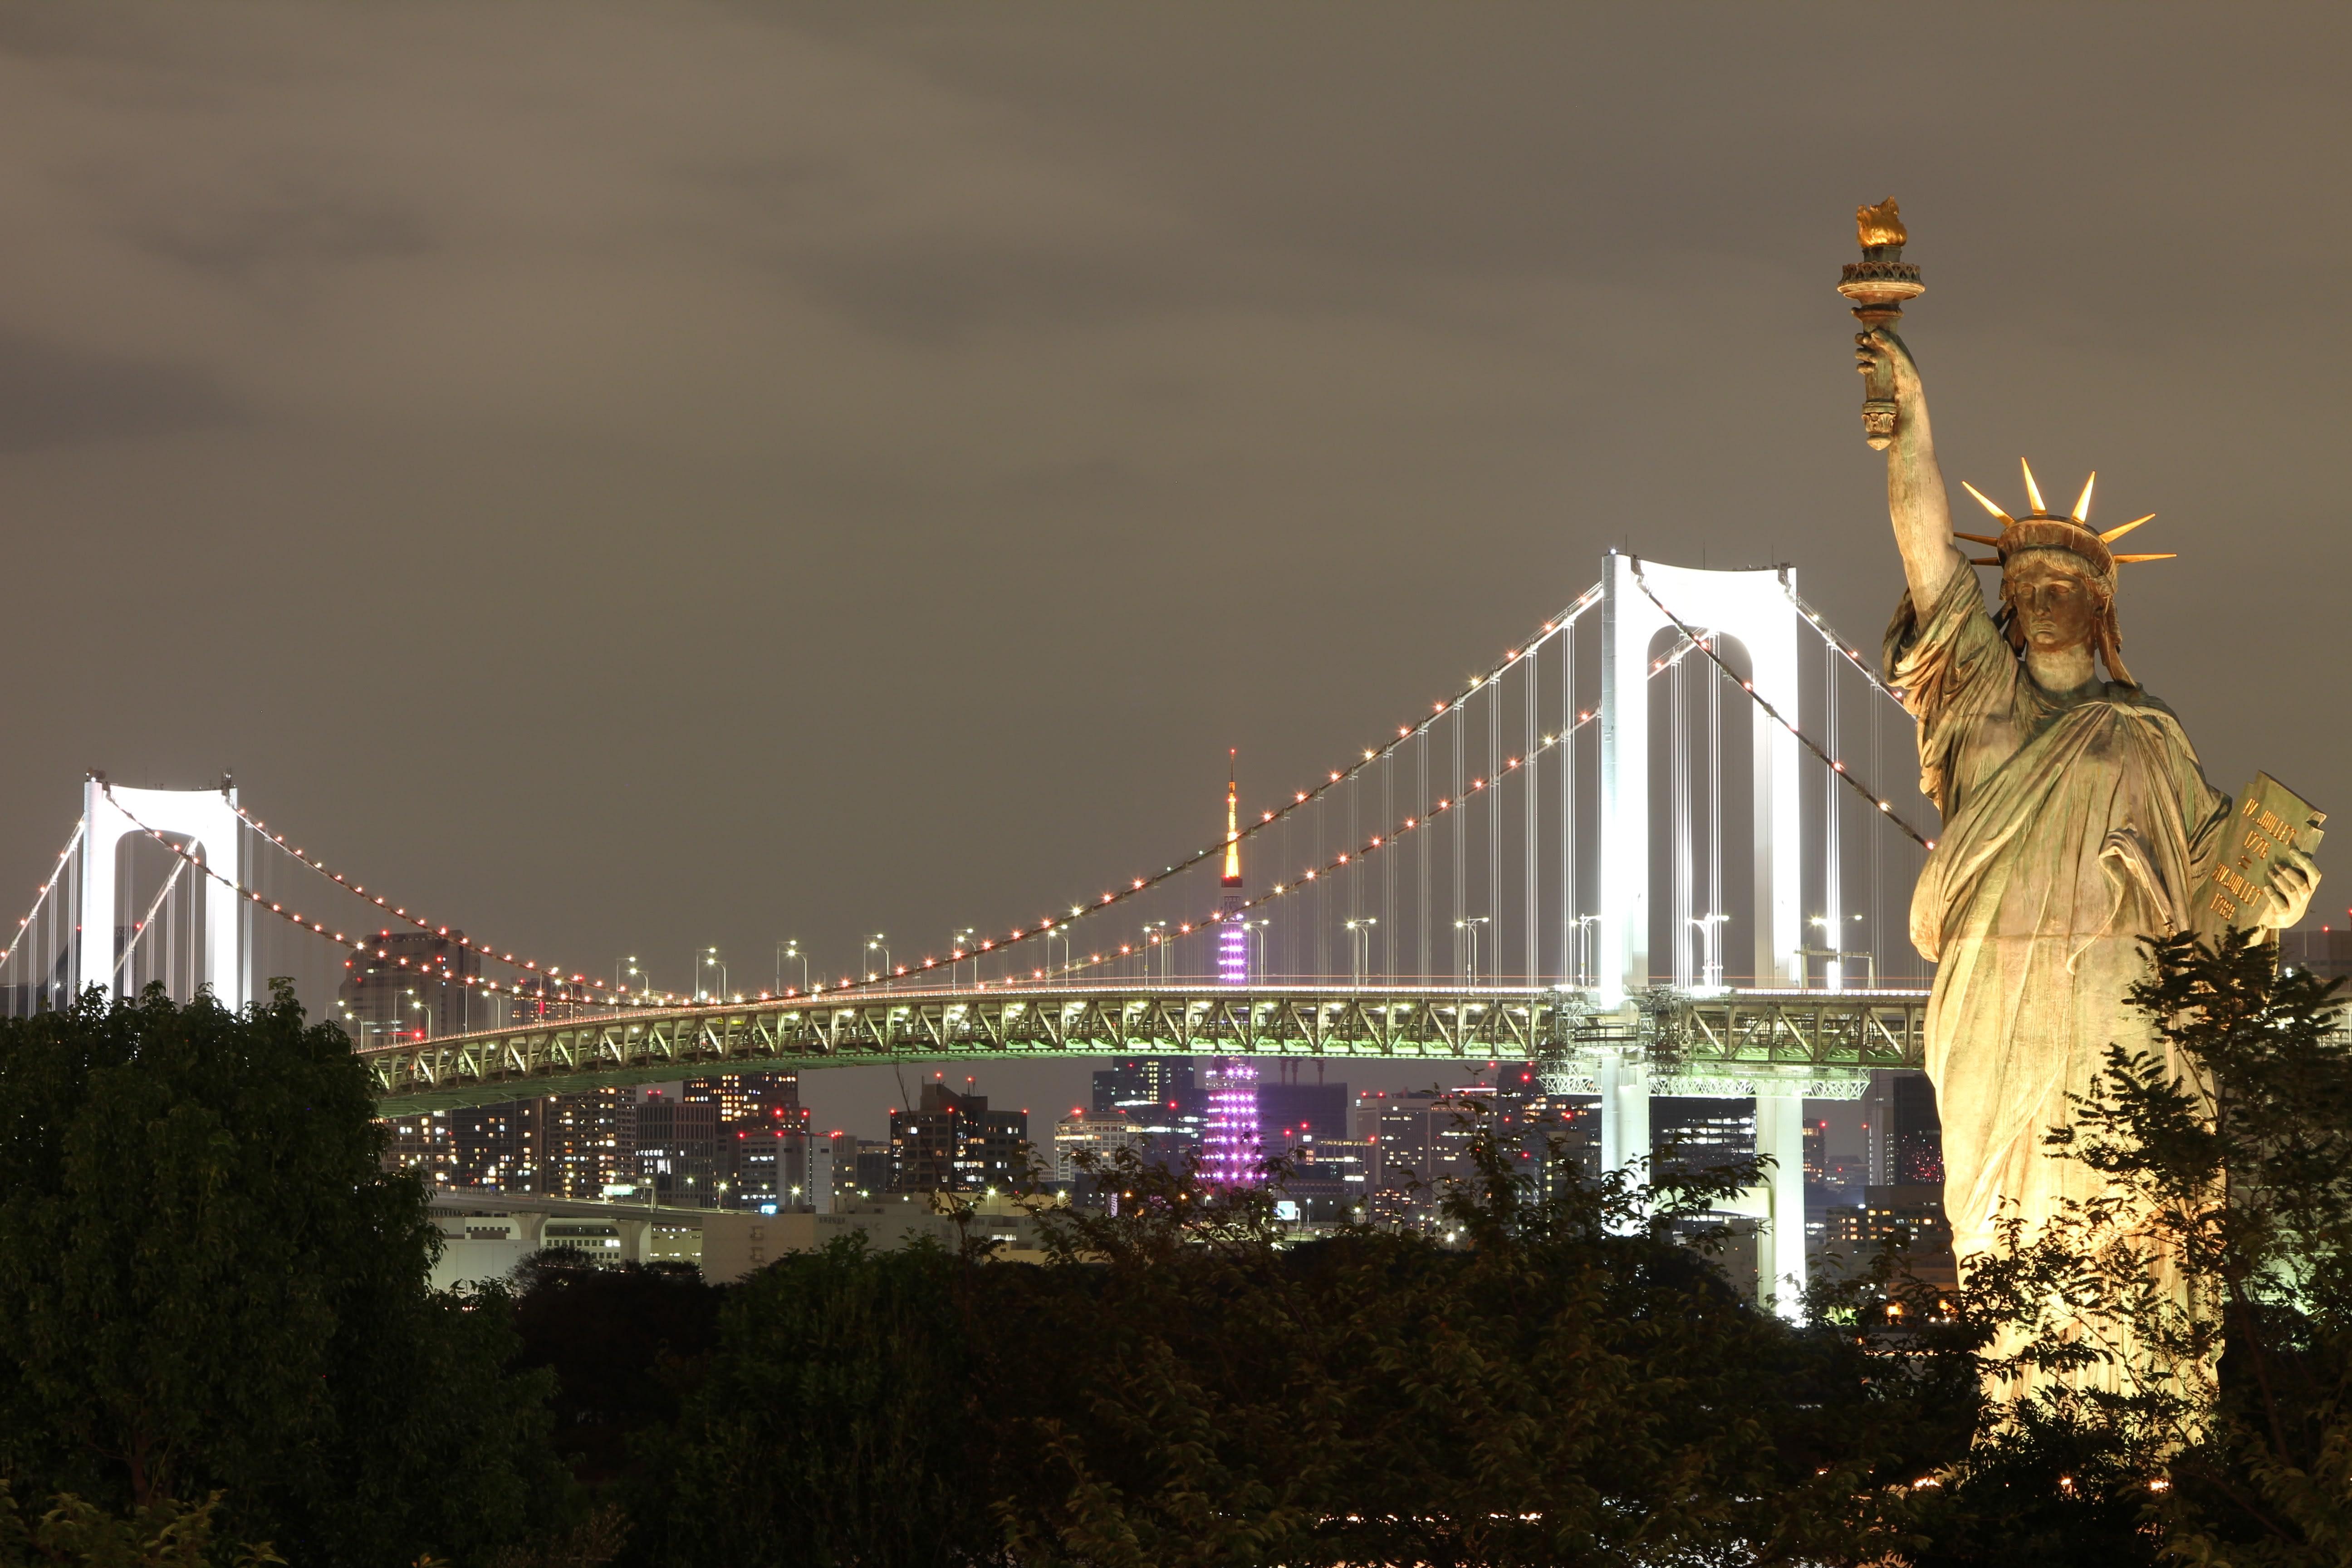 Statue of Liberty Kazuend Unsplash